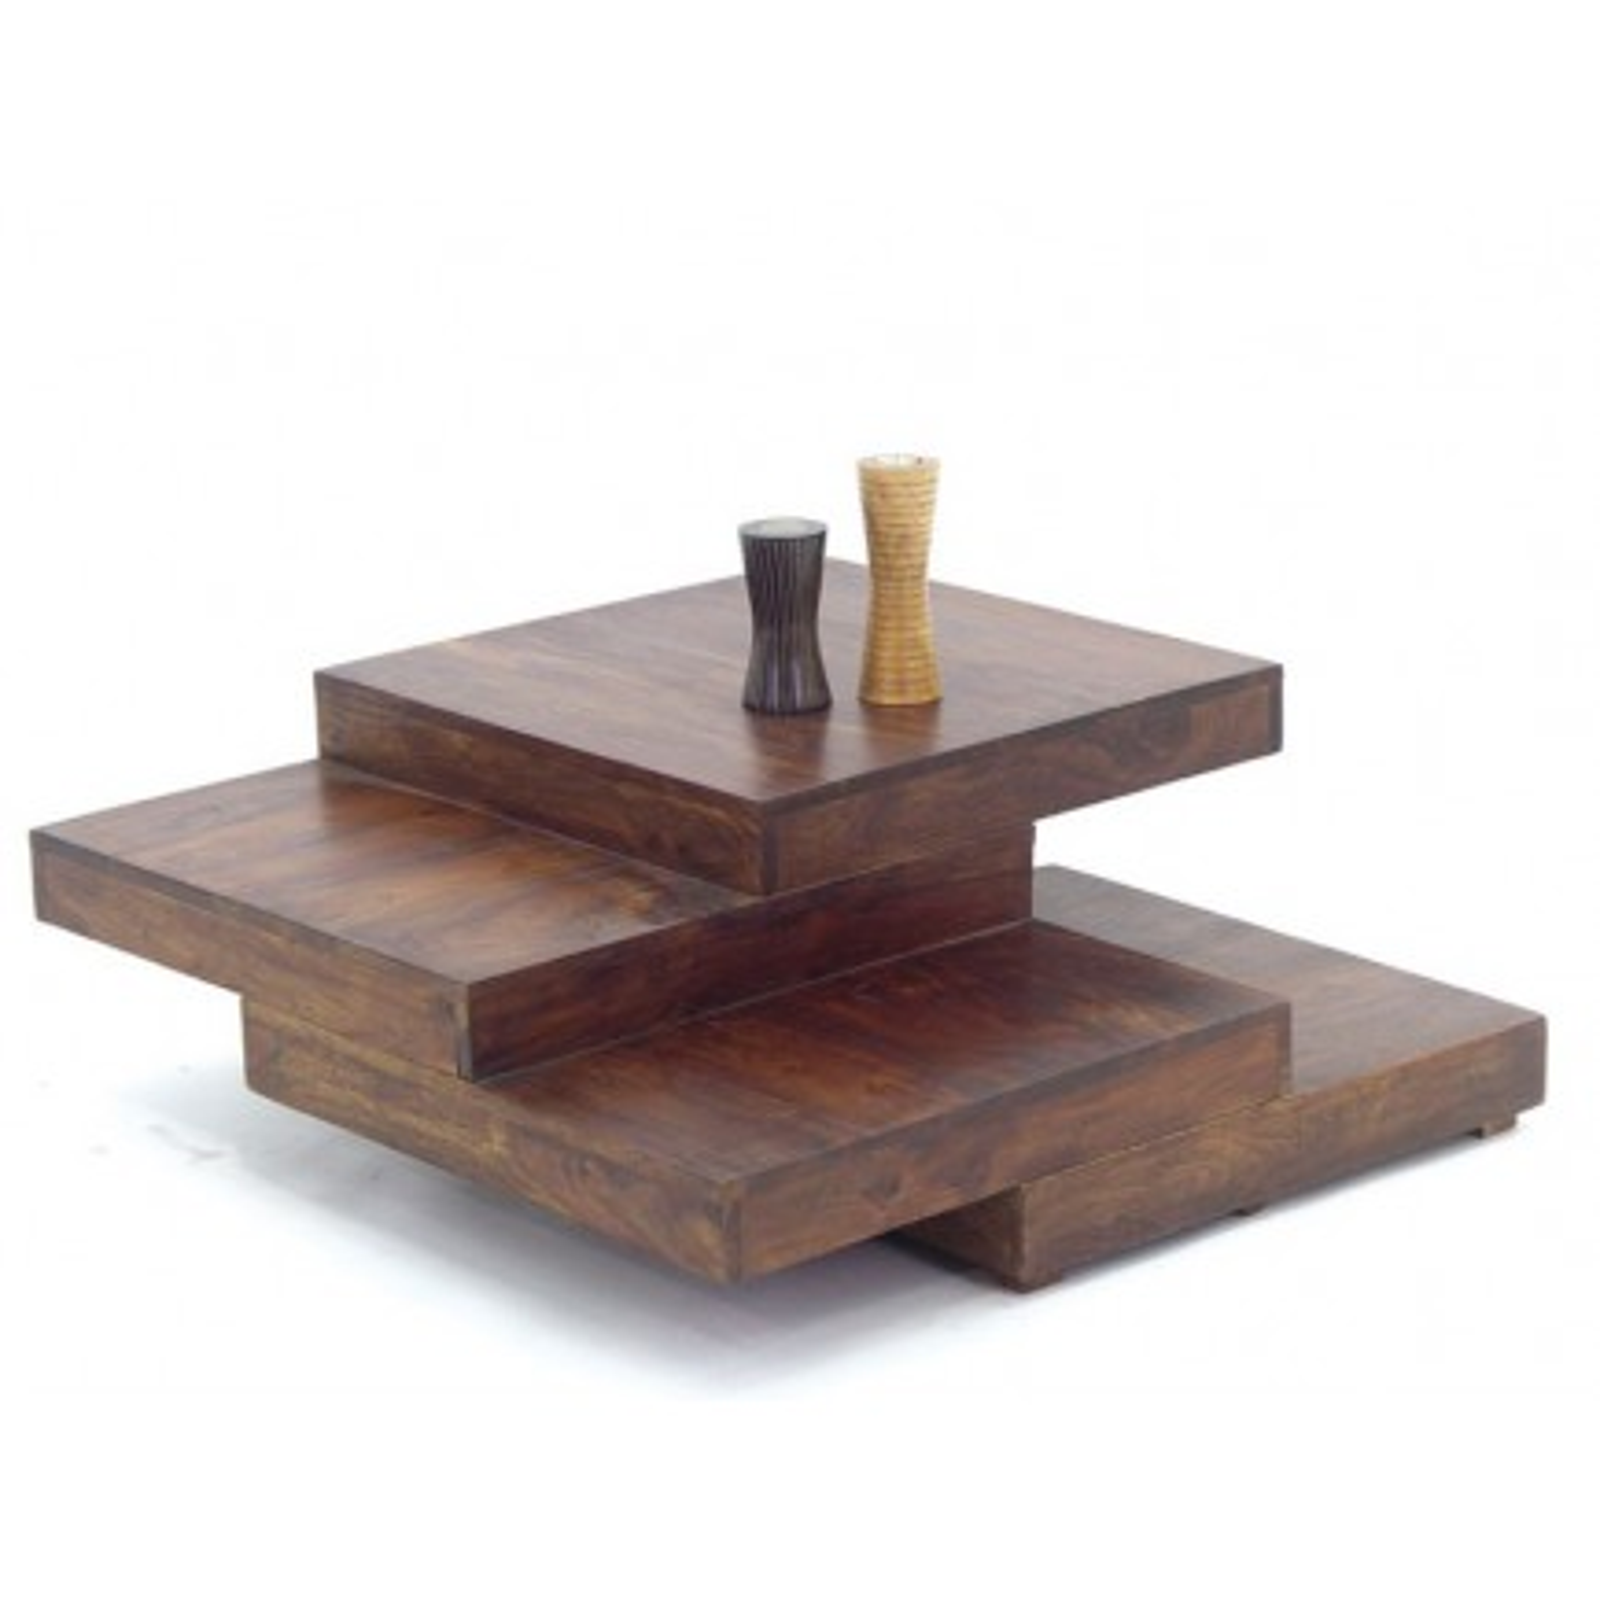 Table Basse Escalier Palissandre Zen - meuble en bois massif